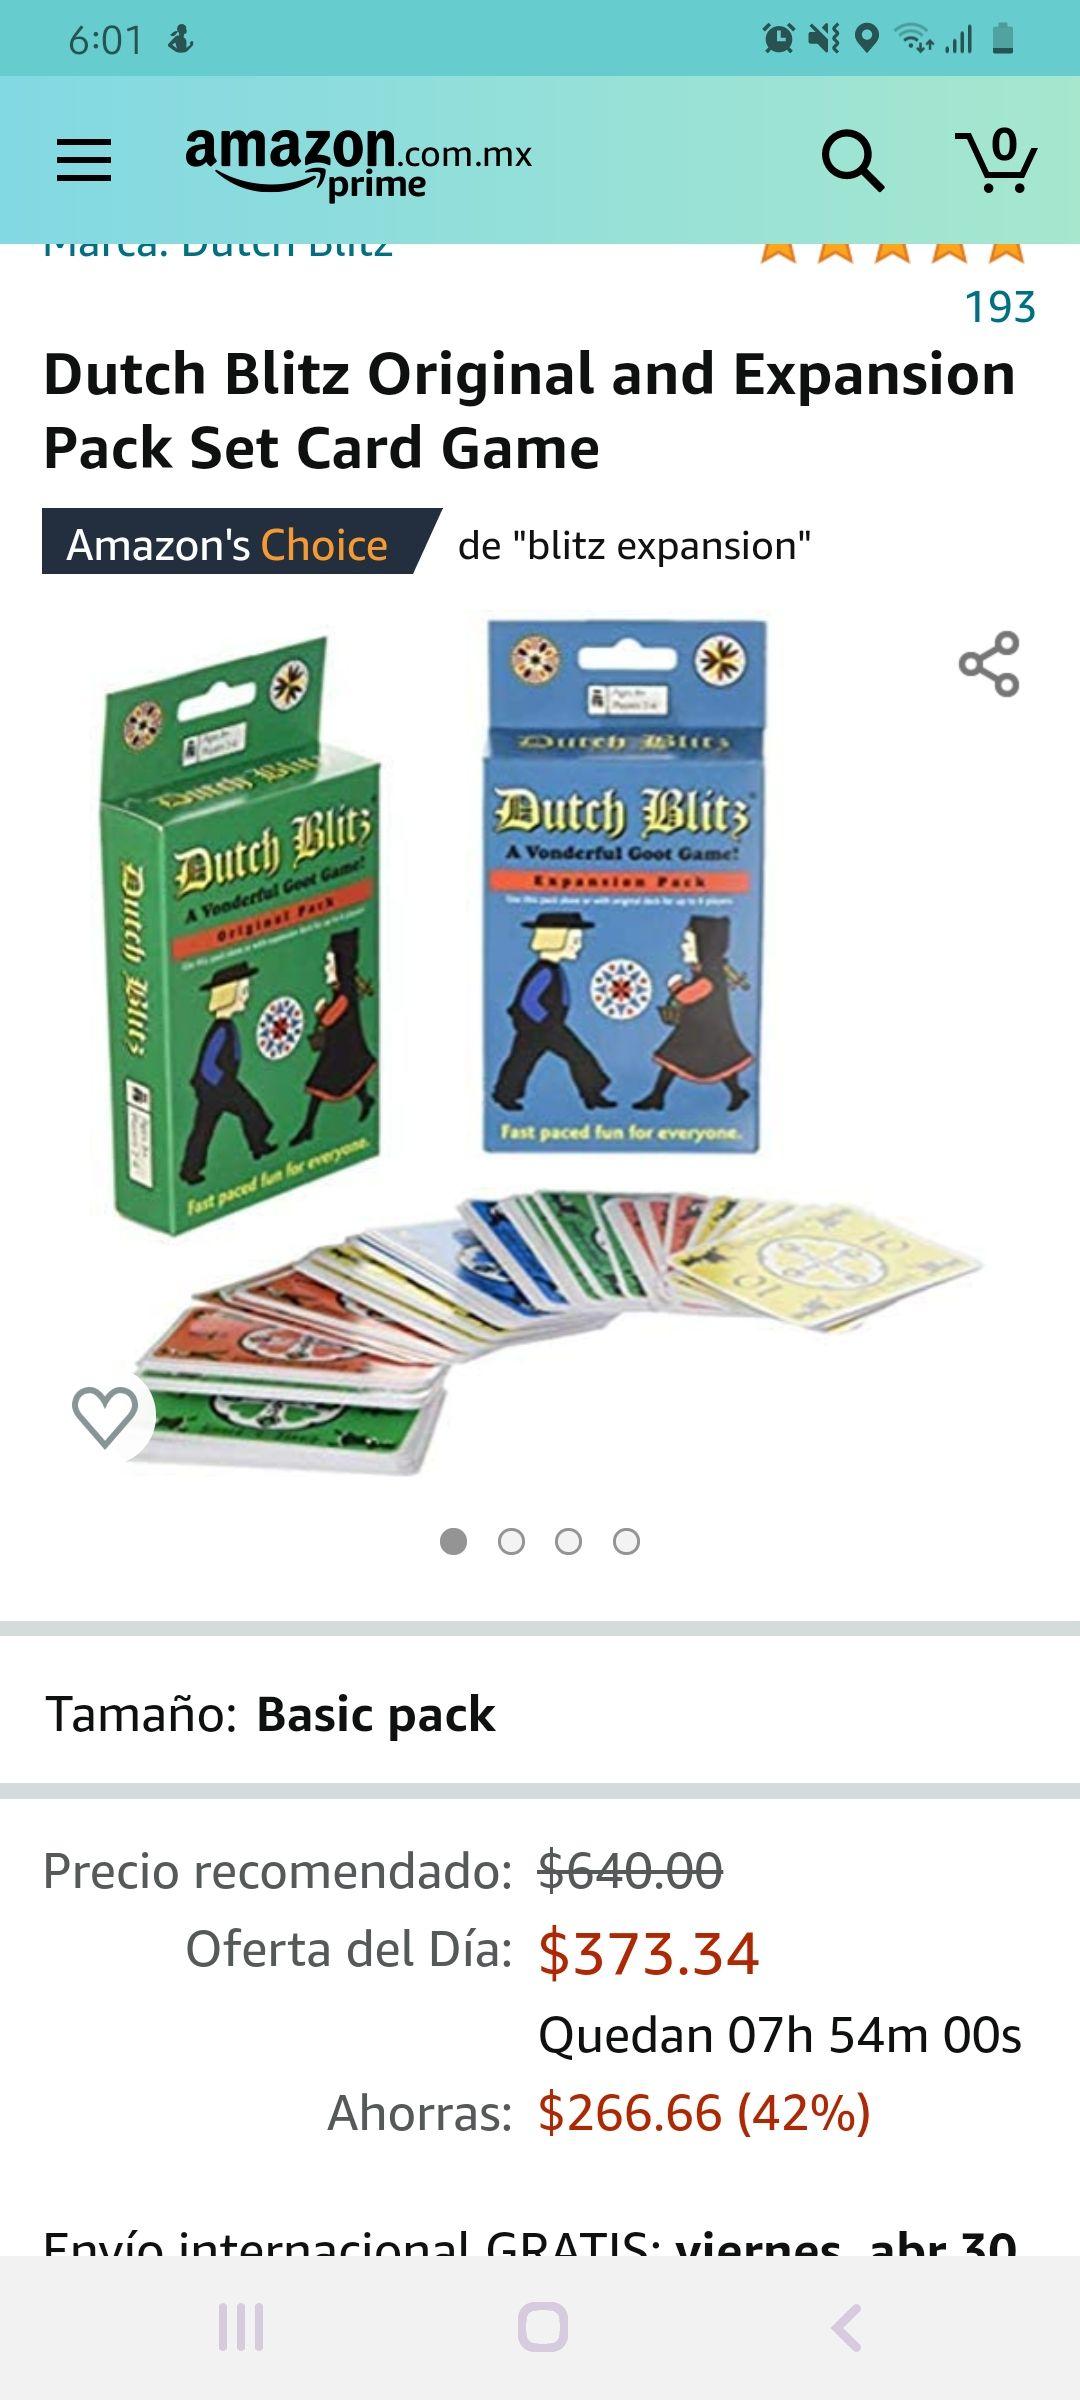 Amazon: Dutch Blitz Original and Expansion Pack Set Card Game